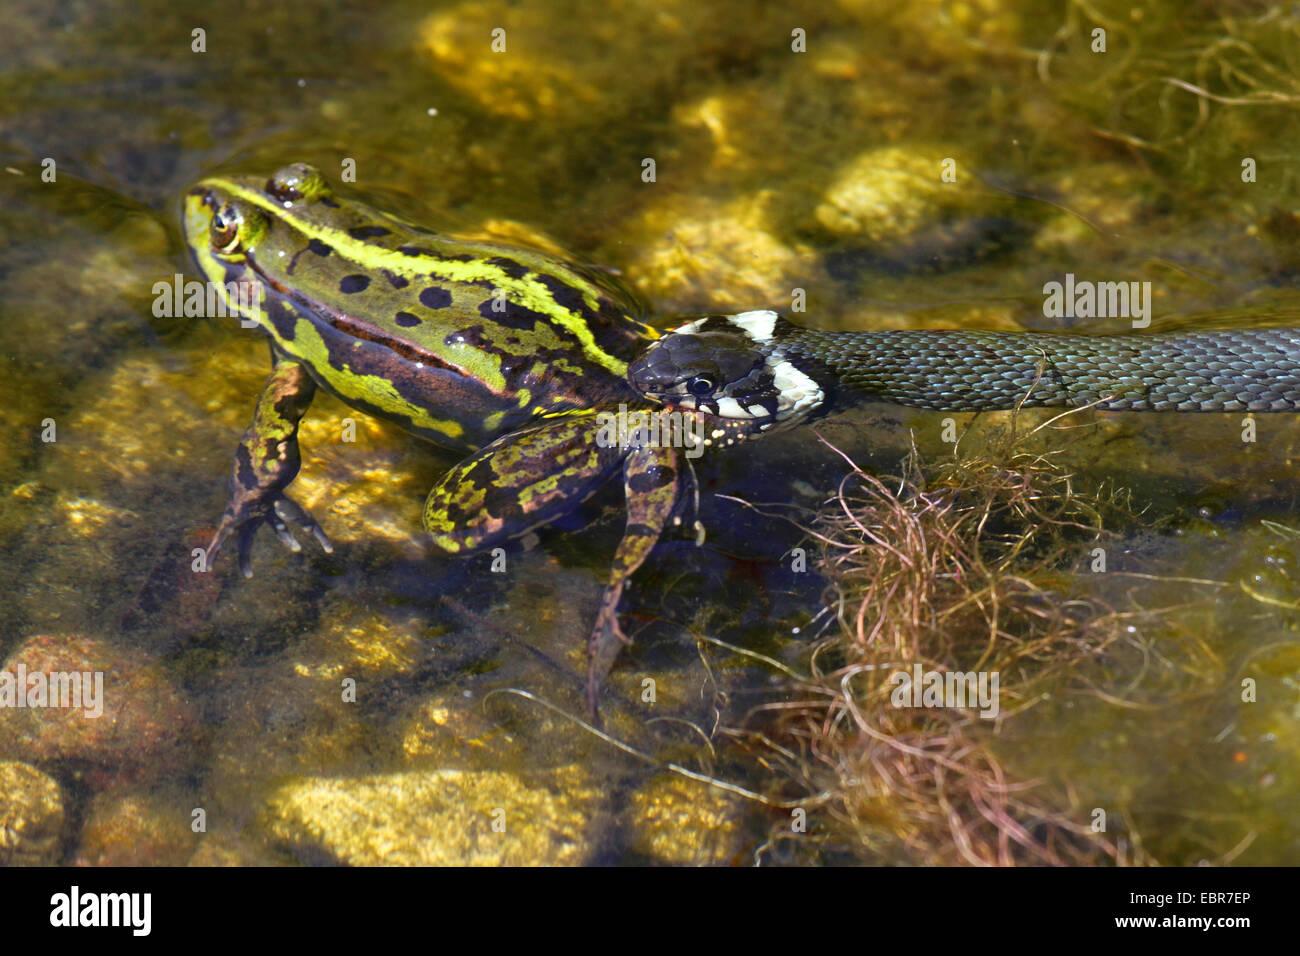 grass snake (Natrix natrix), has caught a frog European edible frog, common edible frog, Germany, Mecklenburg-Western - Stock Image